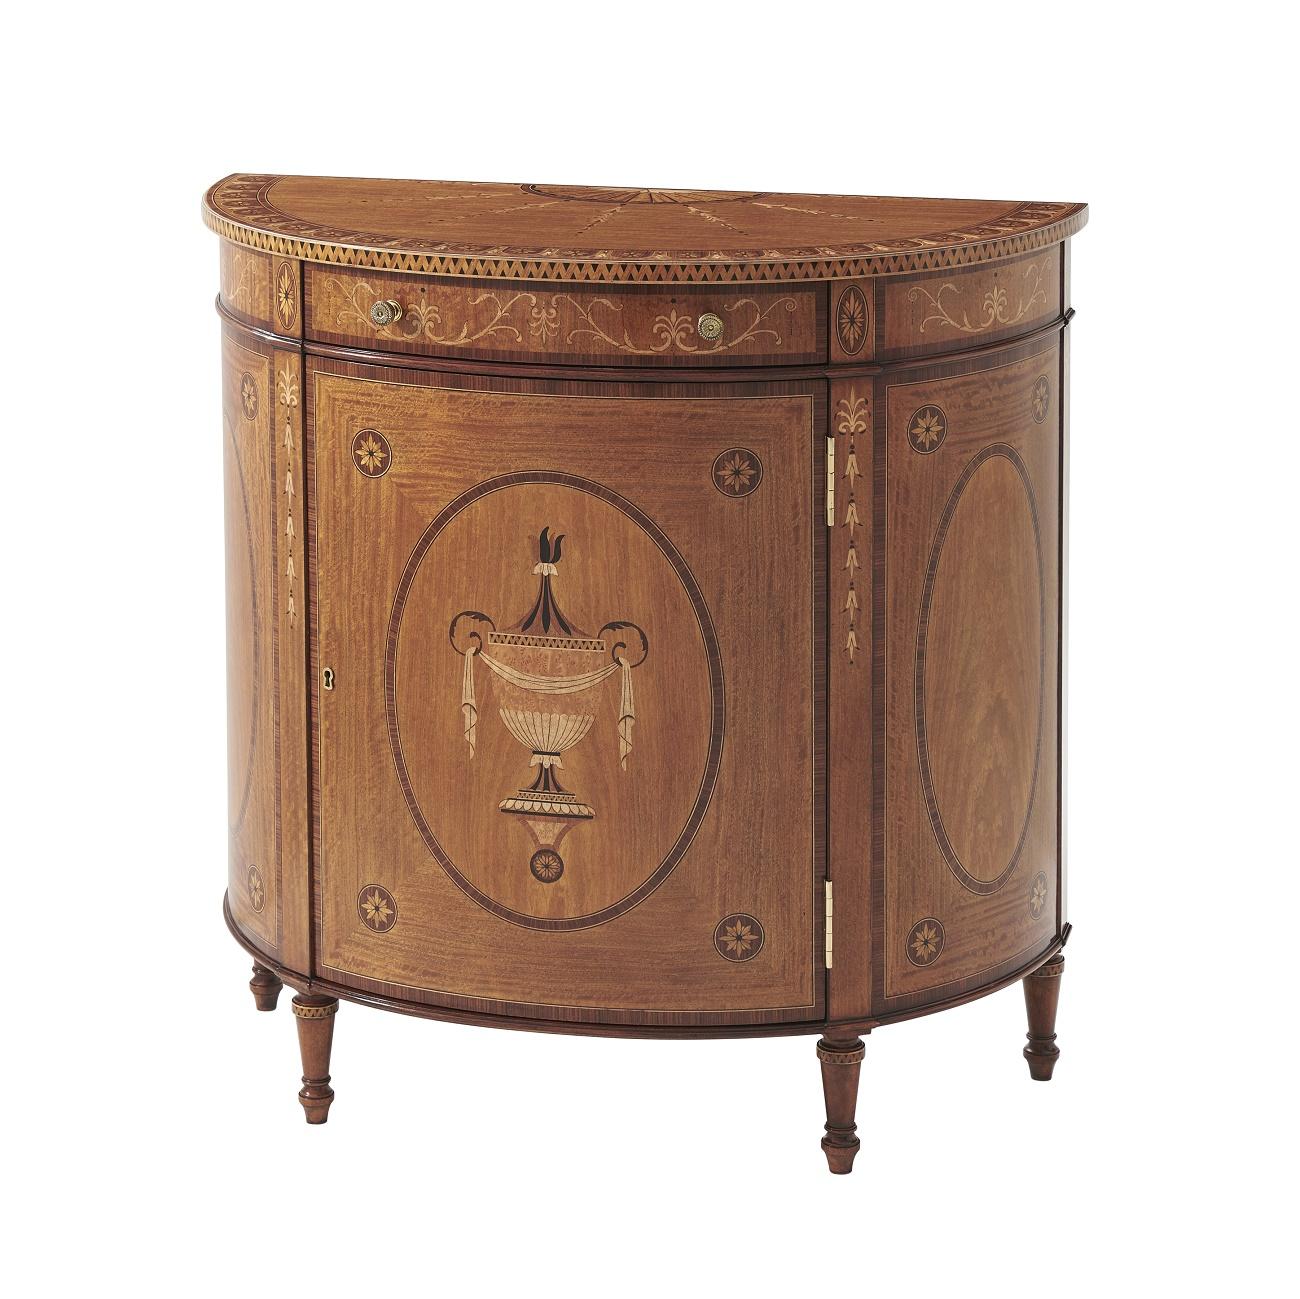 Cabinetmakers Masterpiece, Theodore Alexander Cabinet Brooklyn, New York